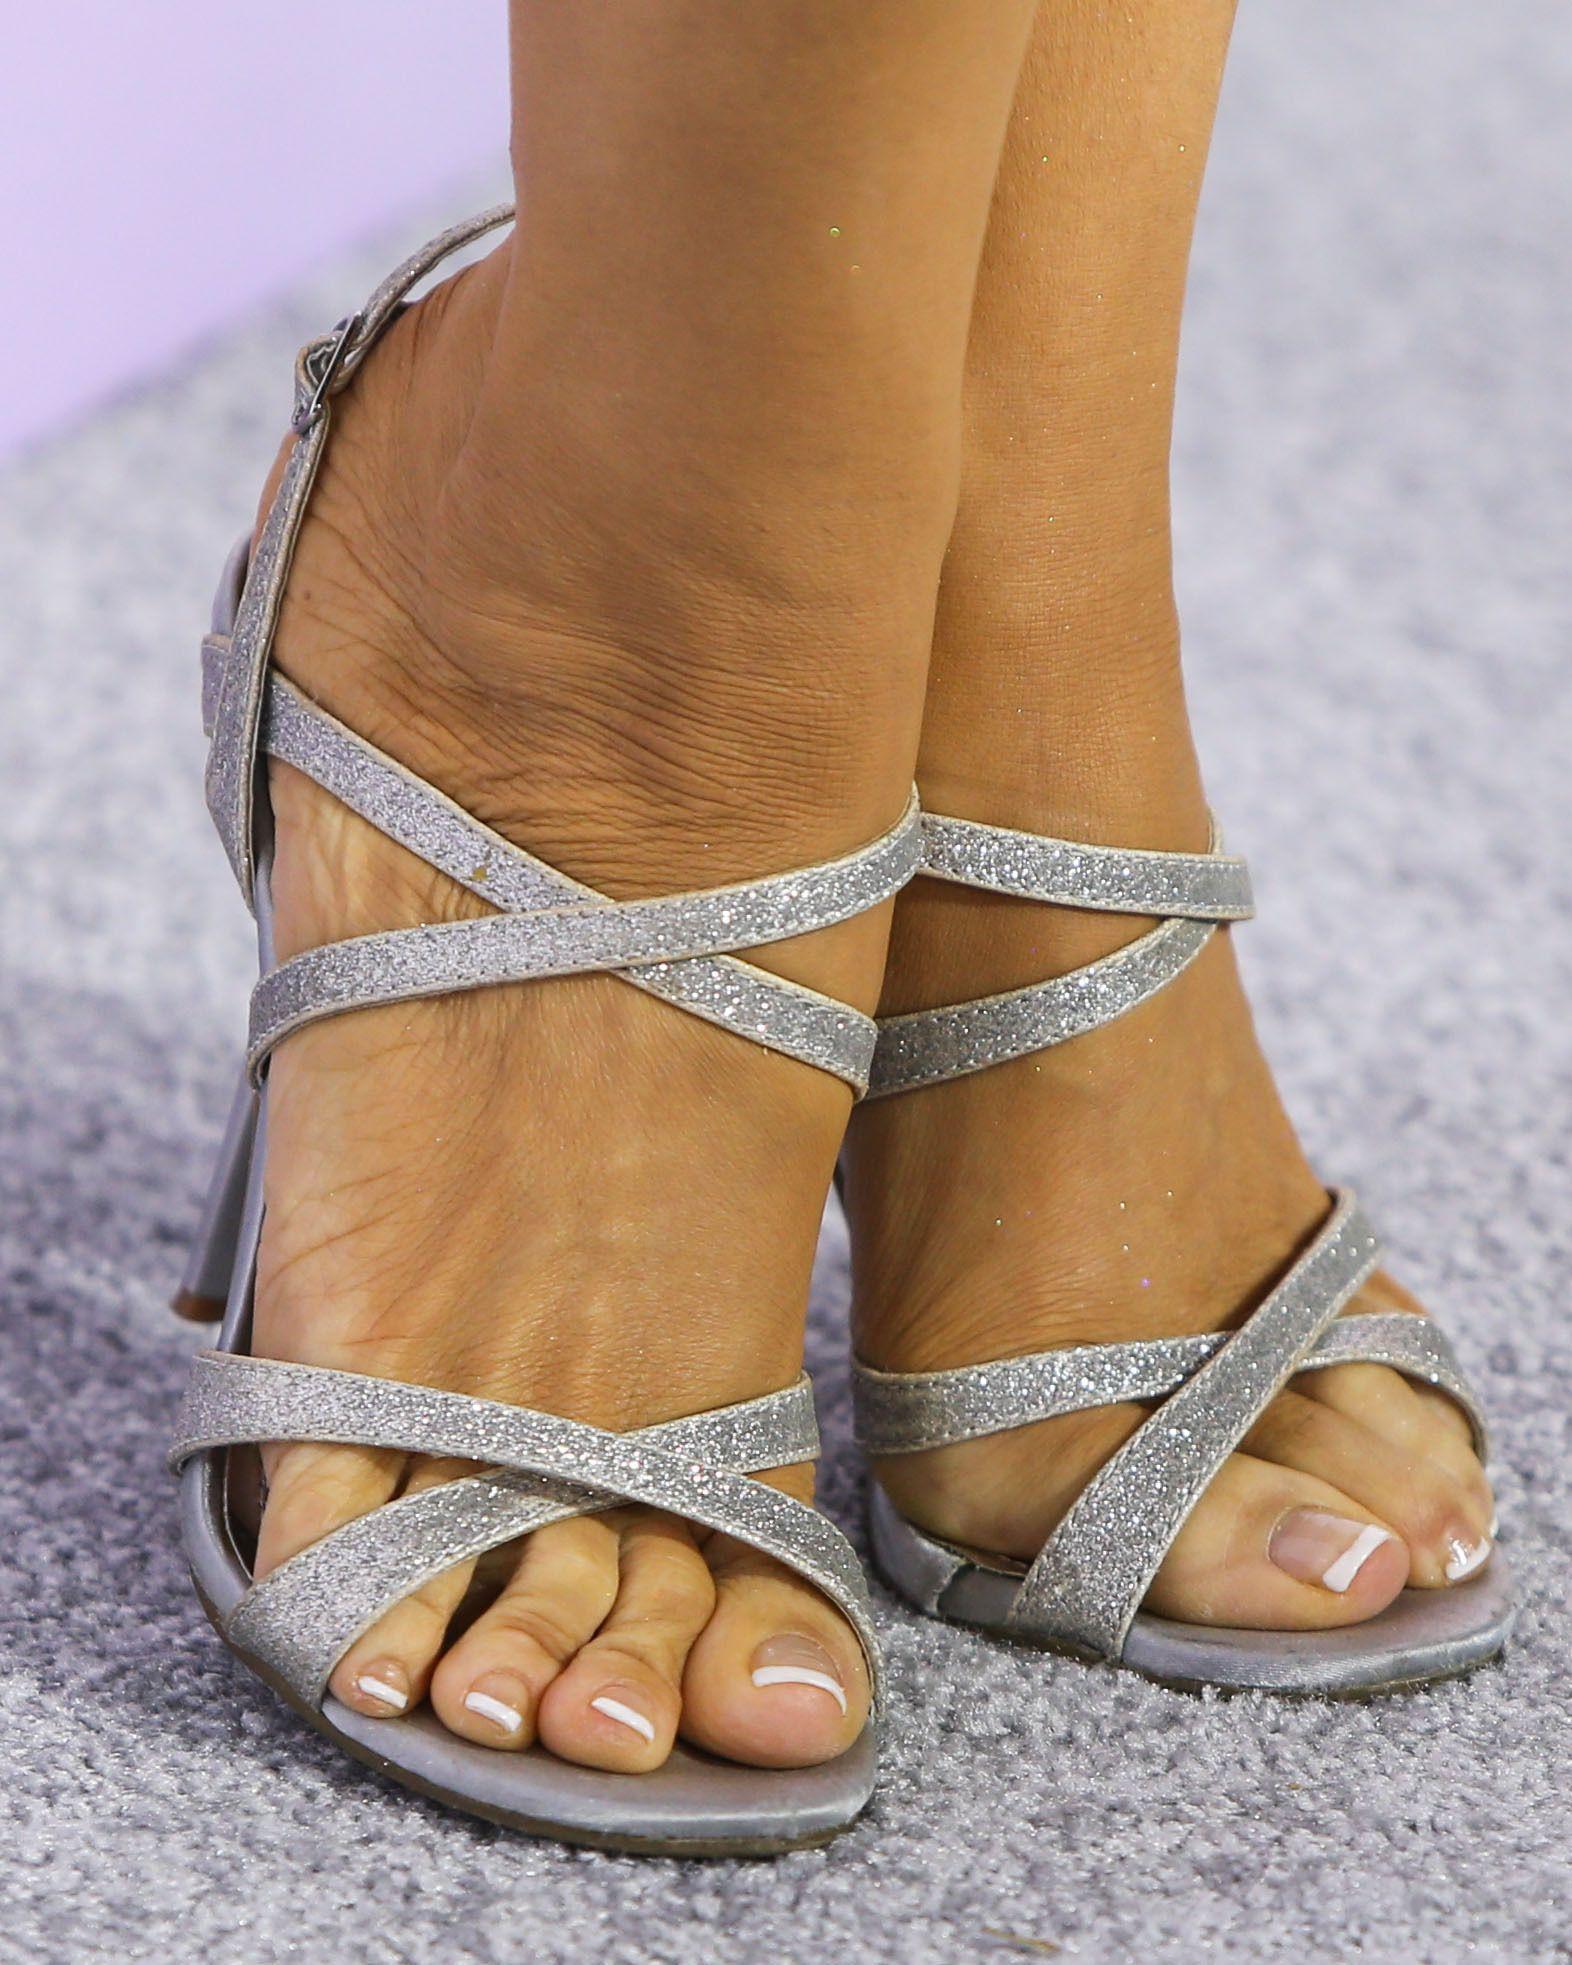 Danica McKellars Feet